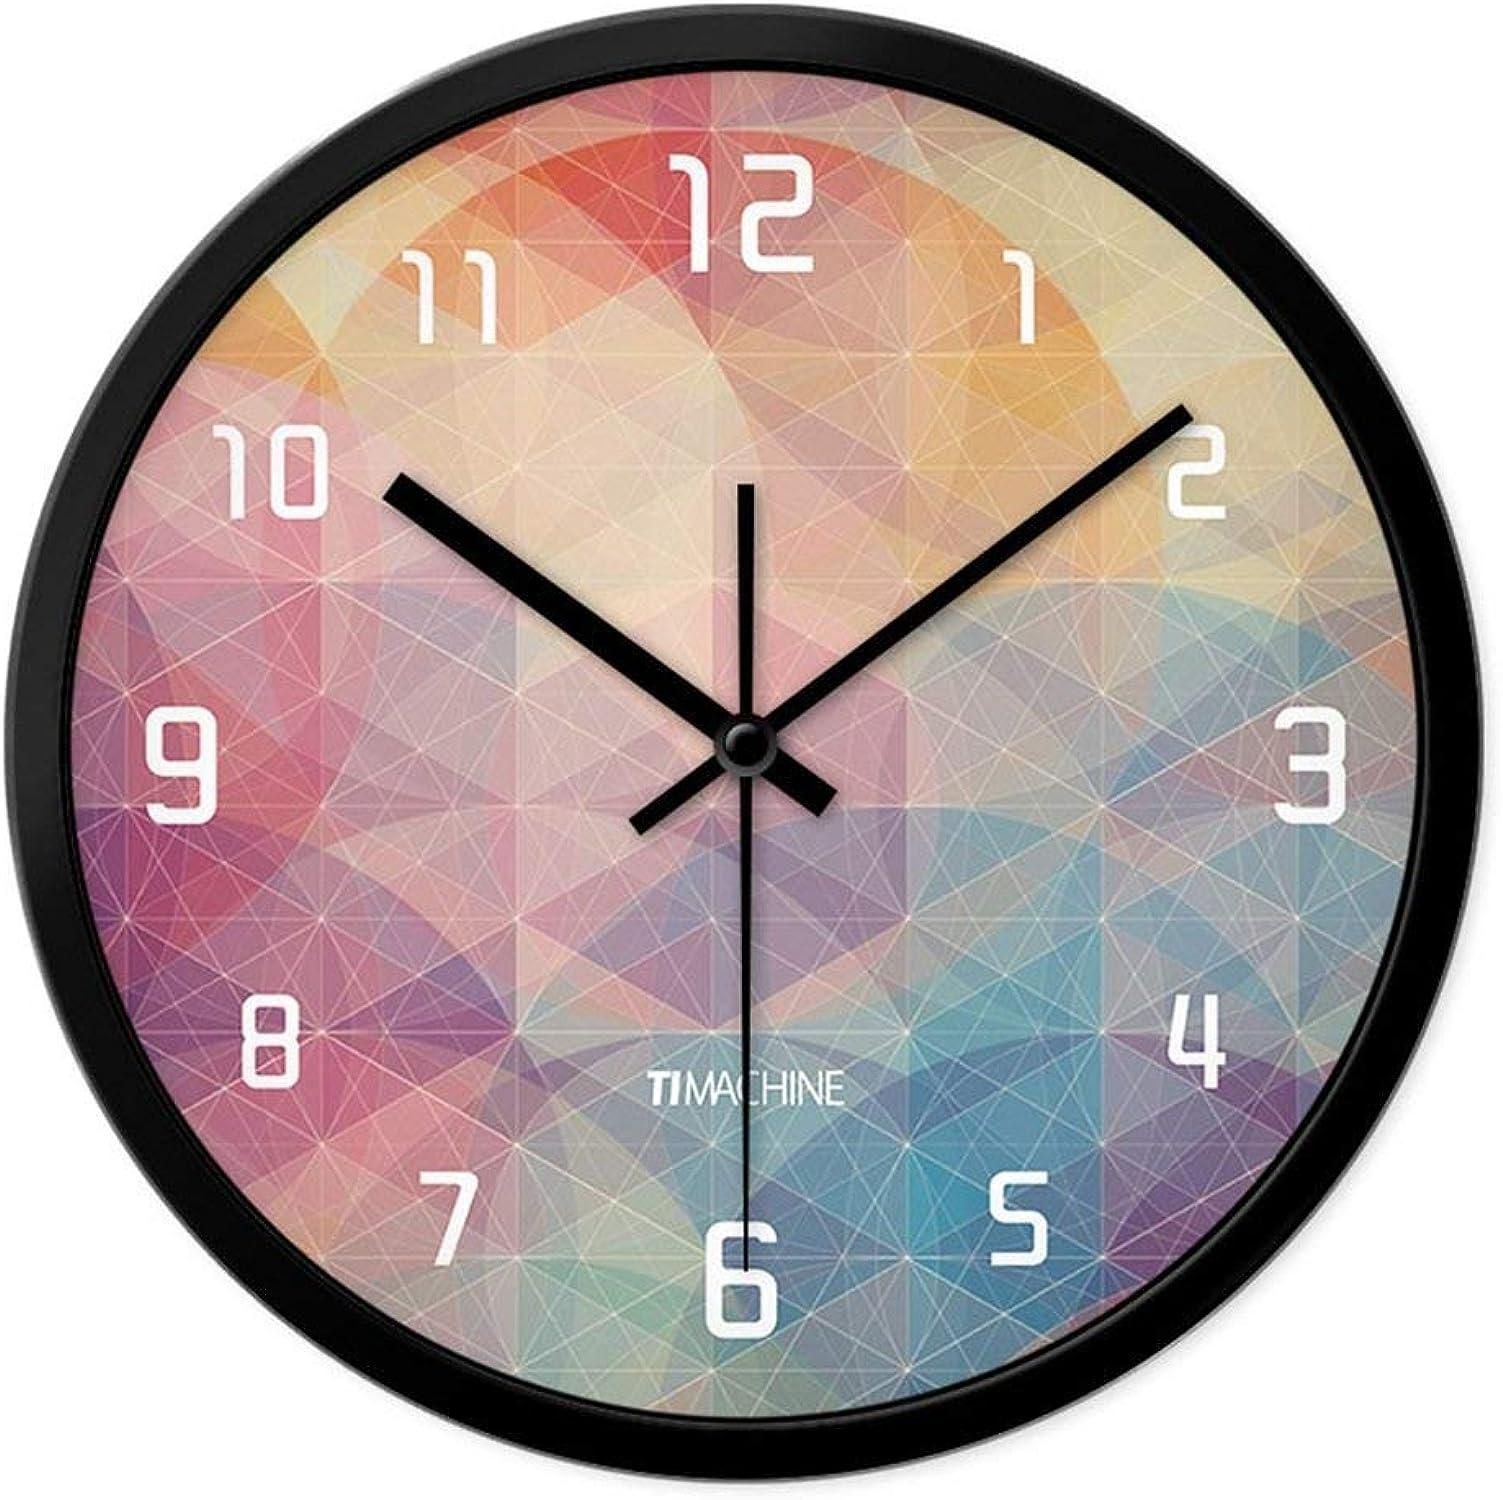 el mejor servicio post-venta IG Reloj de Parojo Parojo Parojo Bell-Metal Accurate - Relojes Personalizados Reloj de Parojo de Moda Sala de Estar Mesa Colgante Reloj de Cuarzo Moderno Mudo Creativo Grande (12 Pulgadas, 14 Pulgadas,) - 1 Bate  ventas de salida